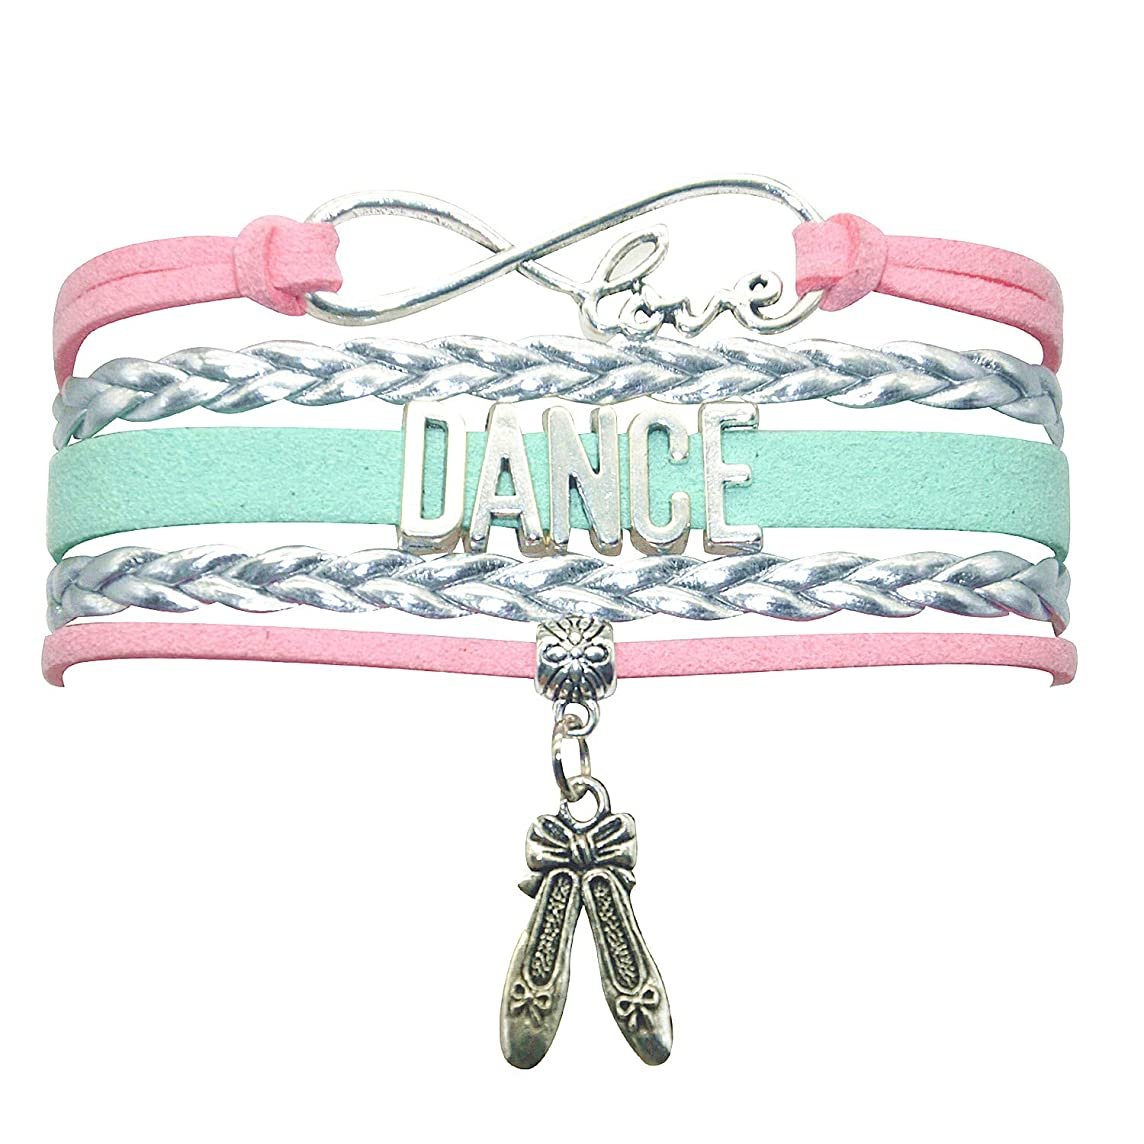 HHHbeauty Girls Dance Bracelet Dancing Belly Ballroom Just Dance Charm Bracelet Dancer Gifts for Women, Girls, Dancers, Men, Boys, Dance Mom, Dance Teacher, Dance Lovers